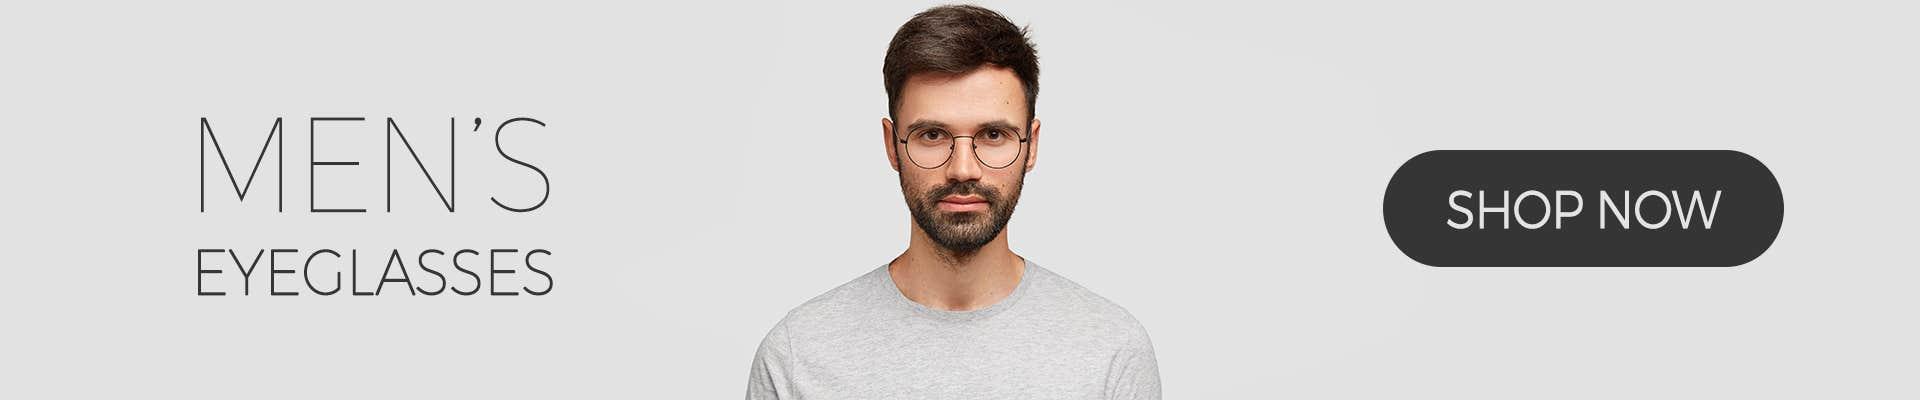 Buy Men's Eyeglasses